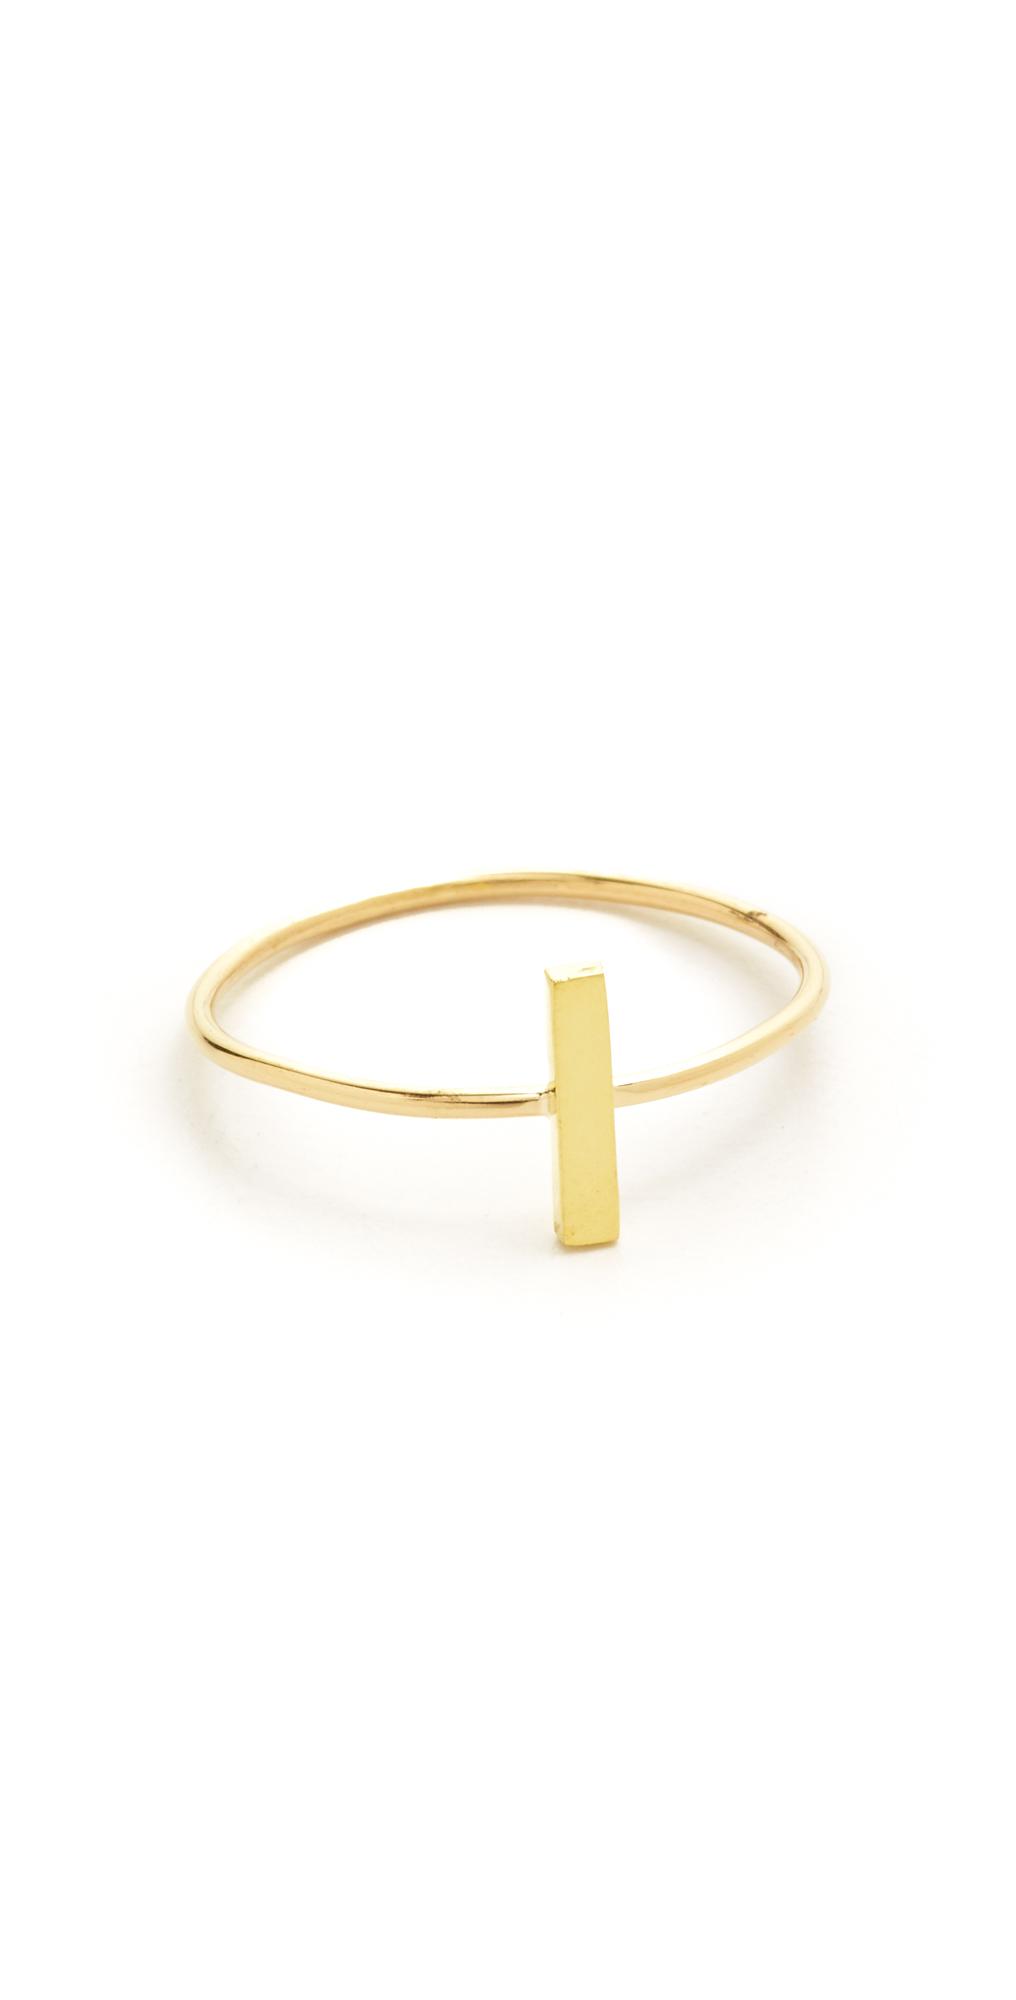 18k Gold Bar Ring Jennifer Meyer Jewelry